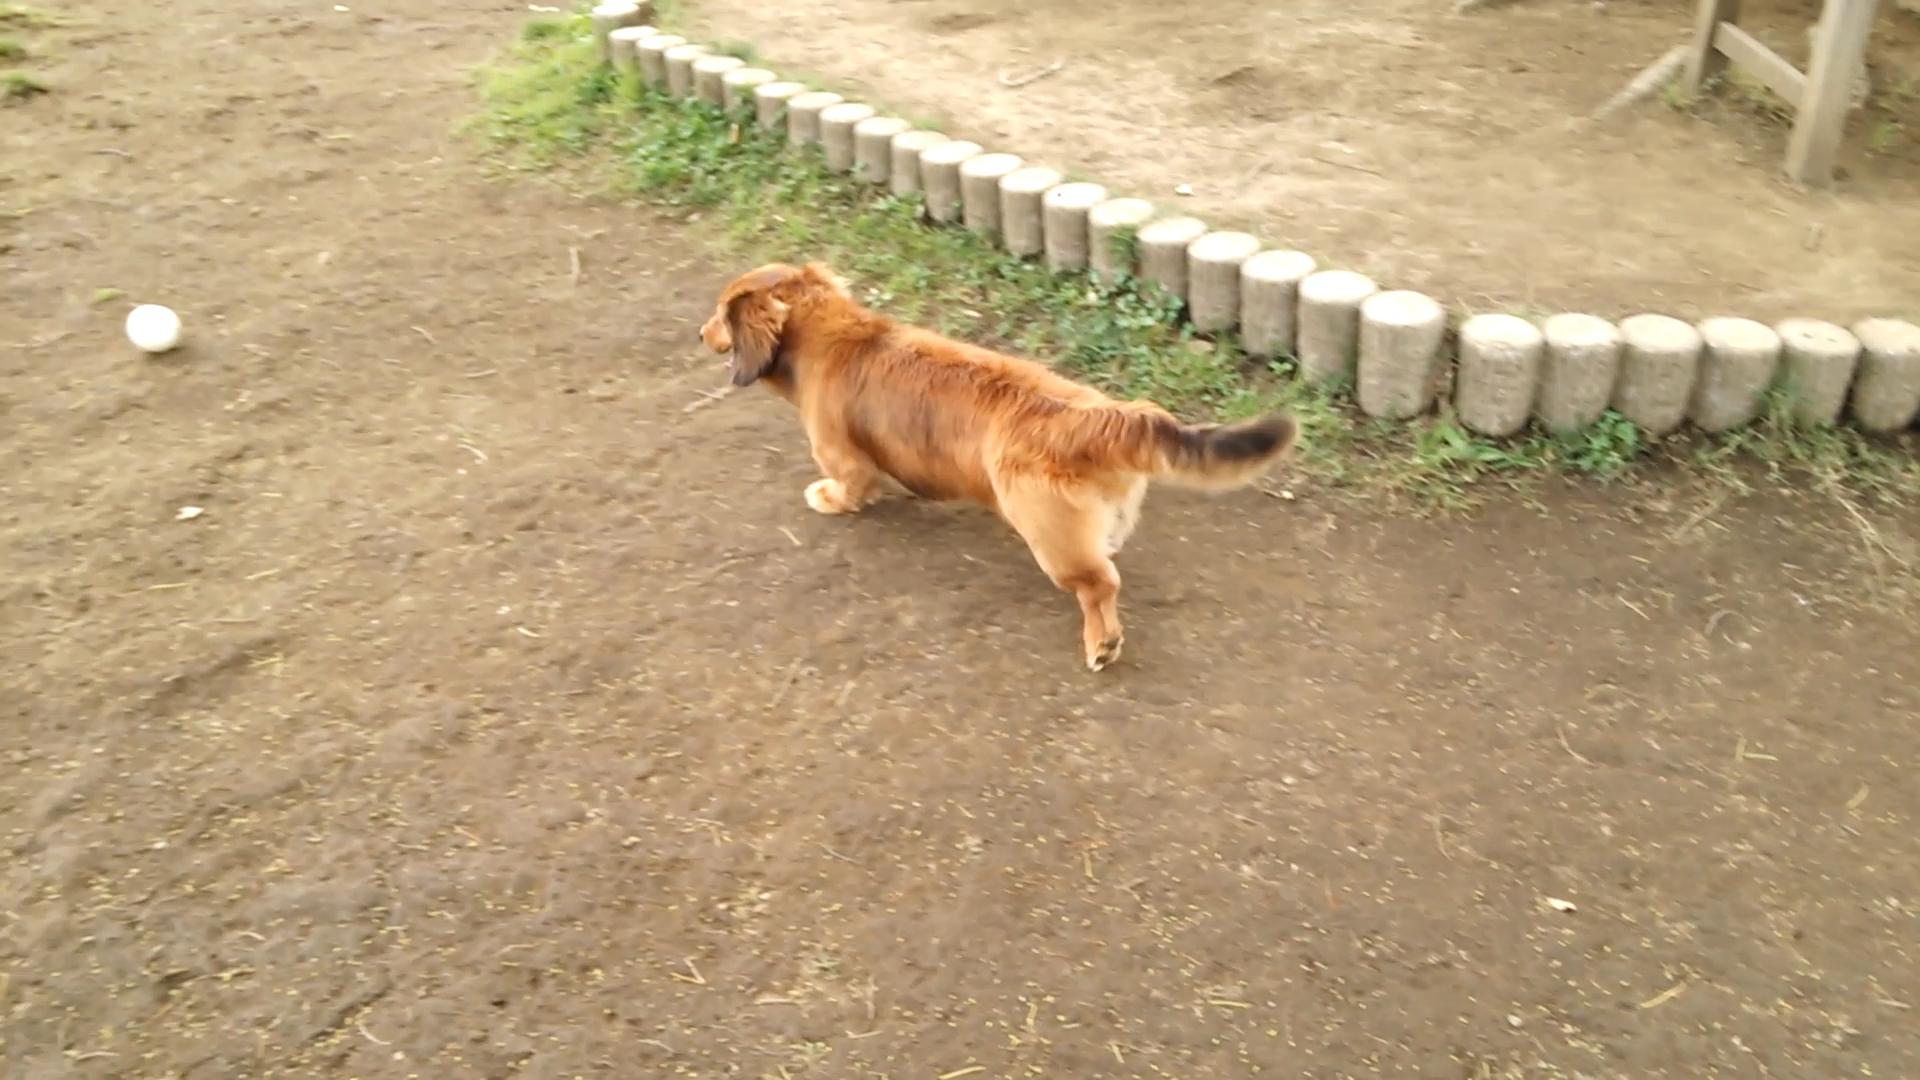 dachshund1.jpg